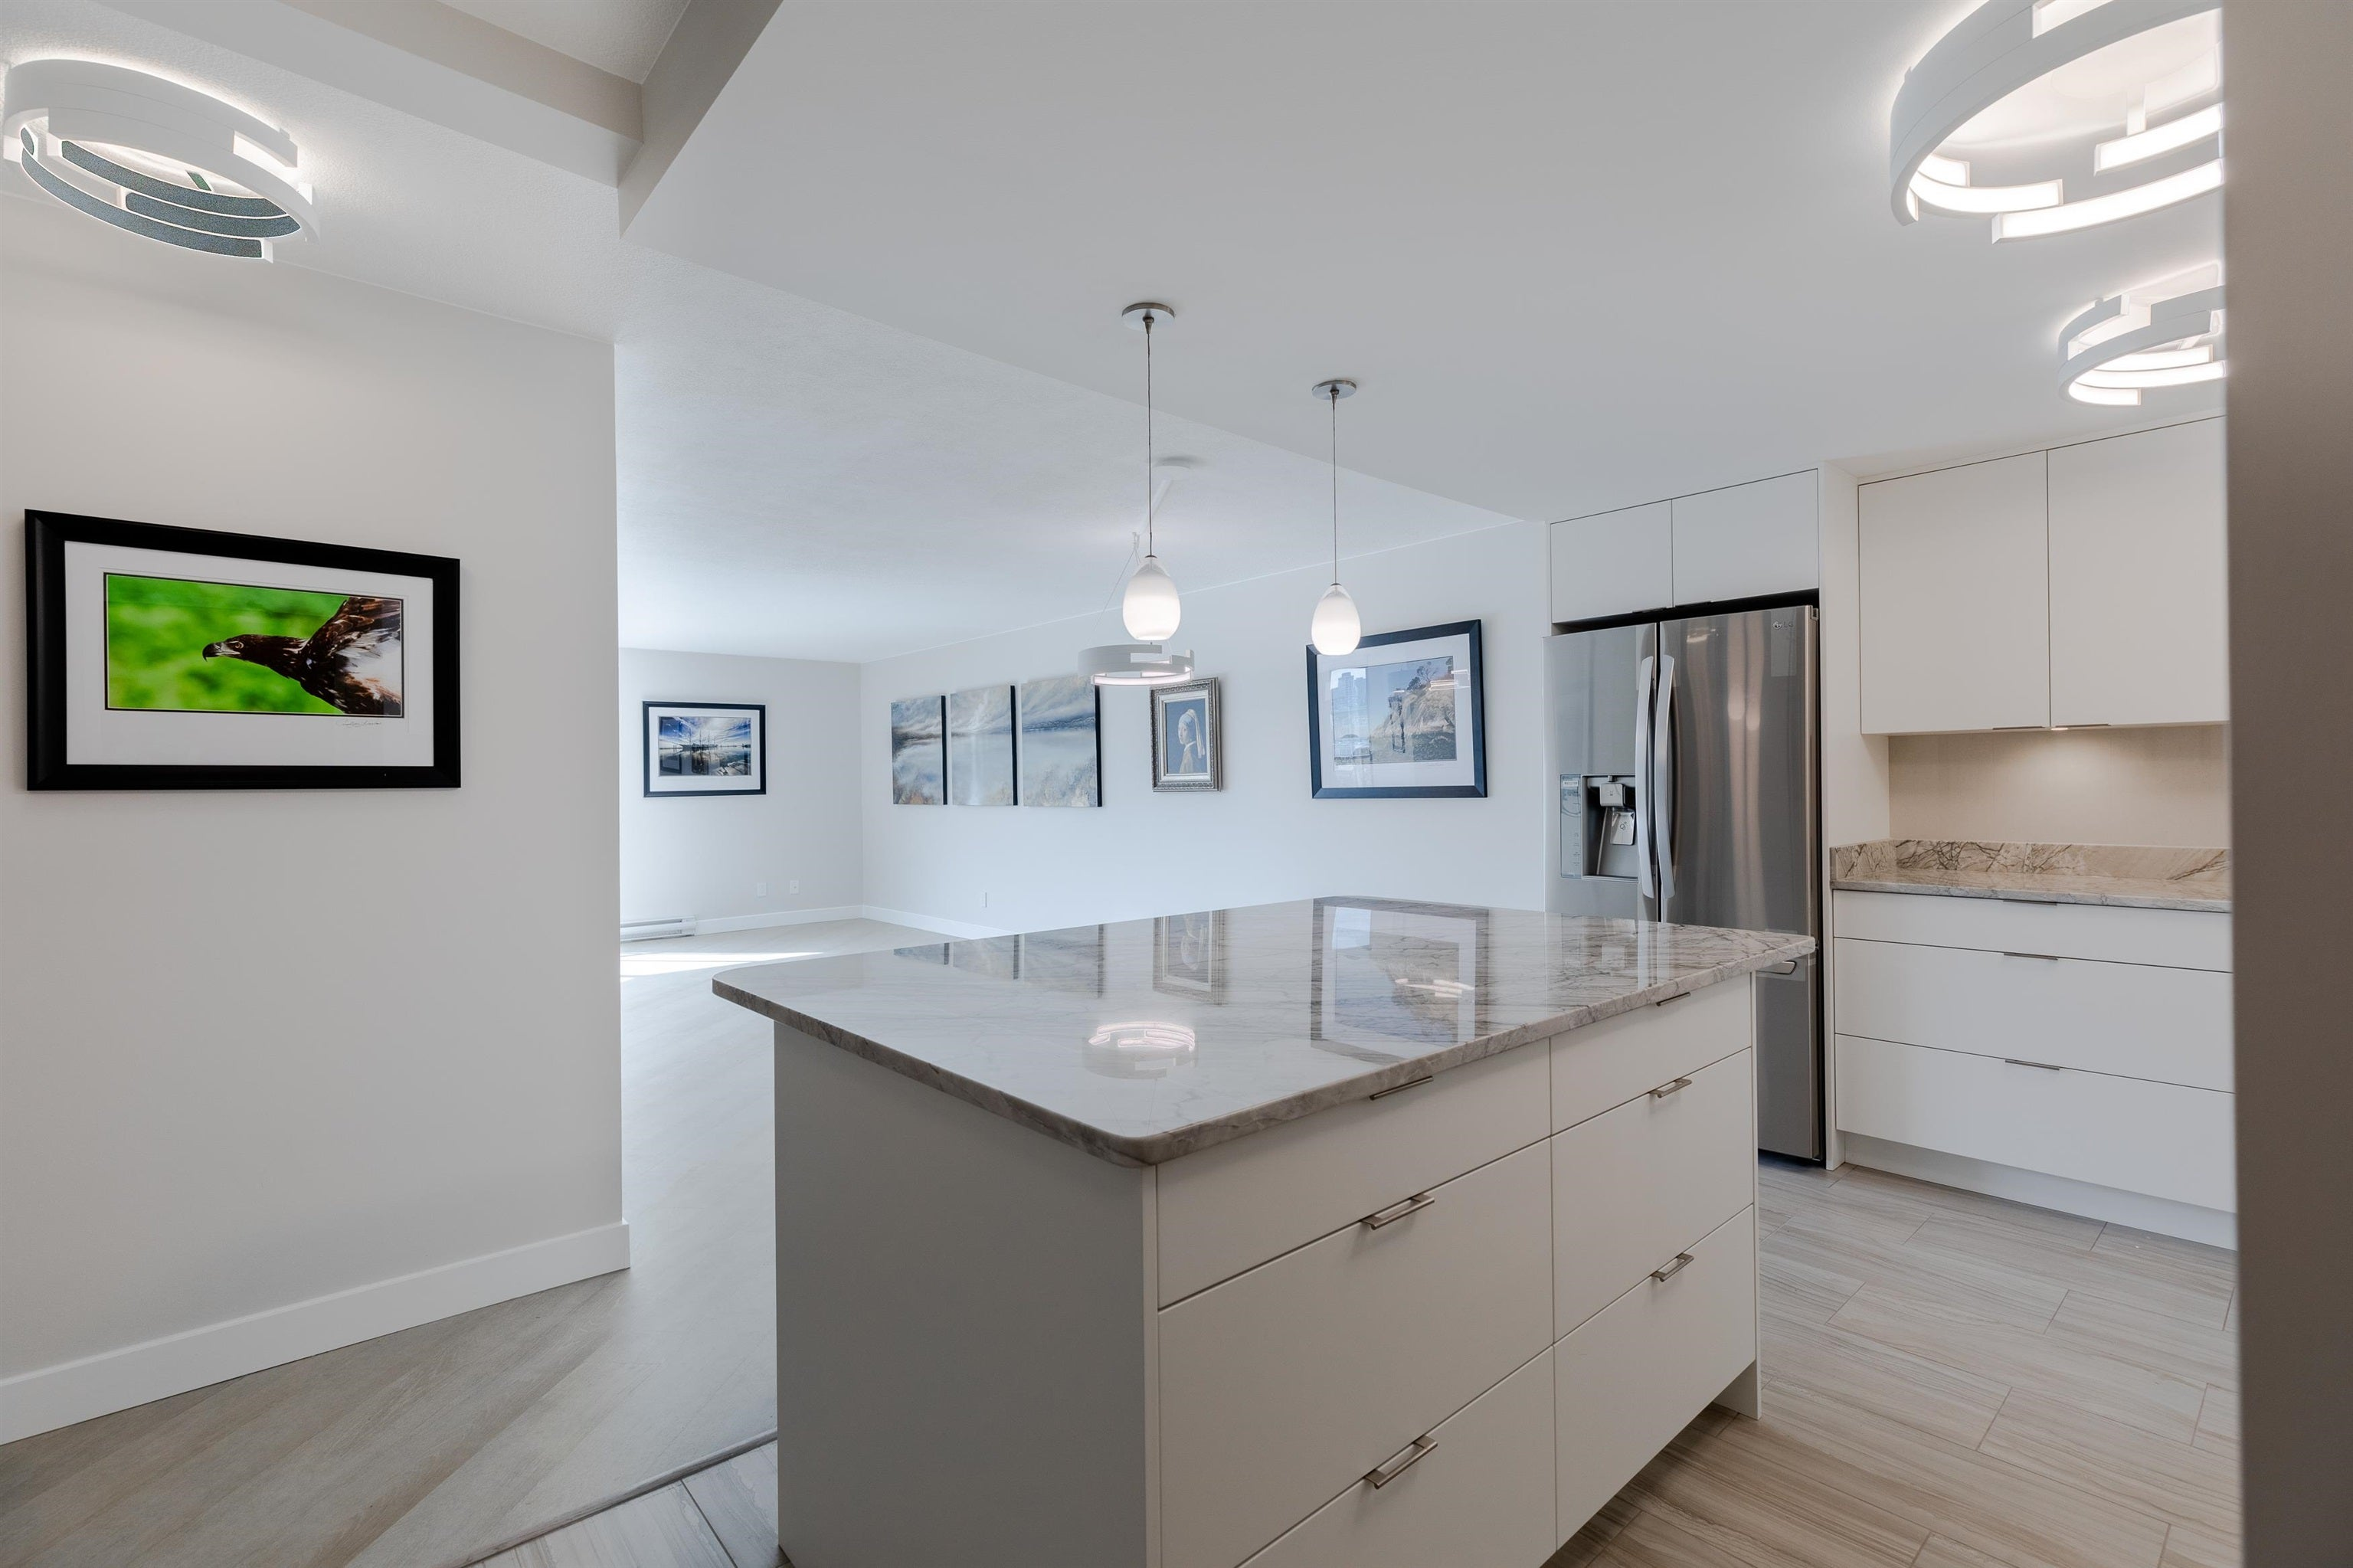 406 1450 PENNYFARTHING DRIVE - False Creek Apartment/Condo for sale, 2 Bedrooms (R2617259) - #11